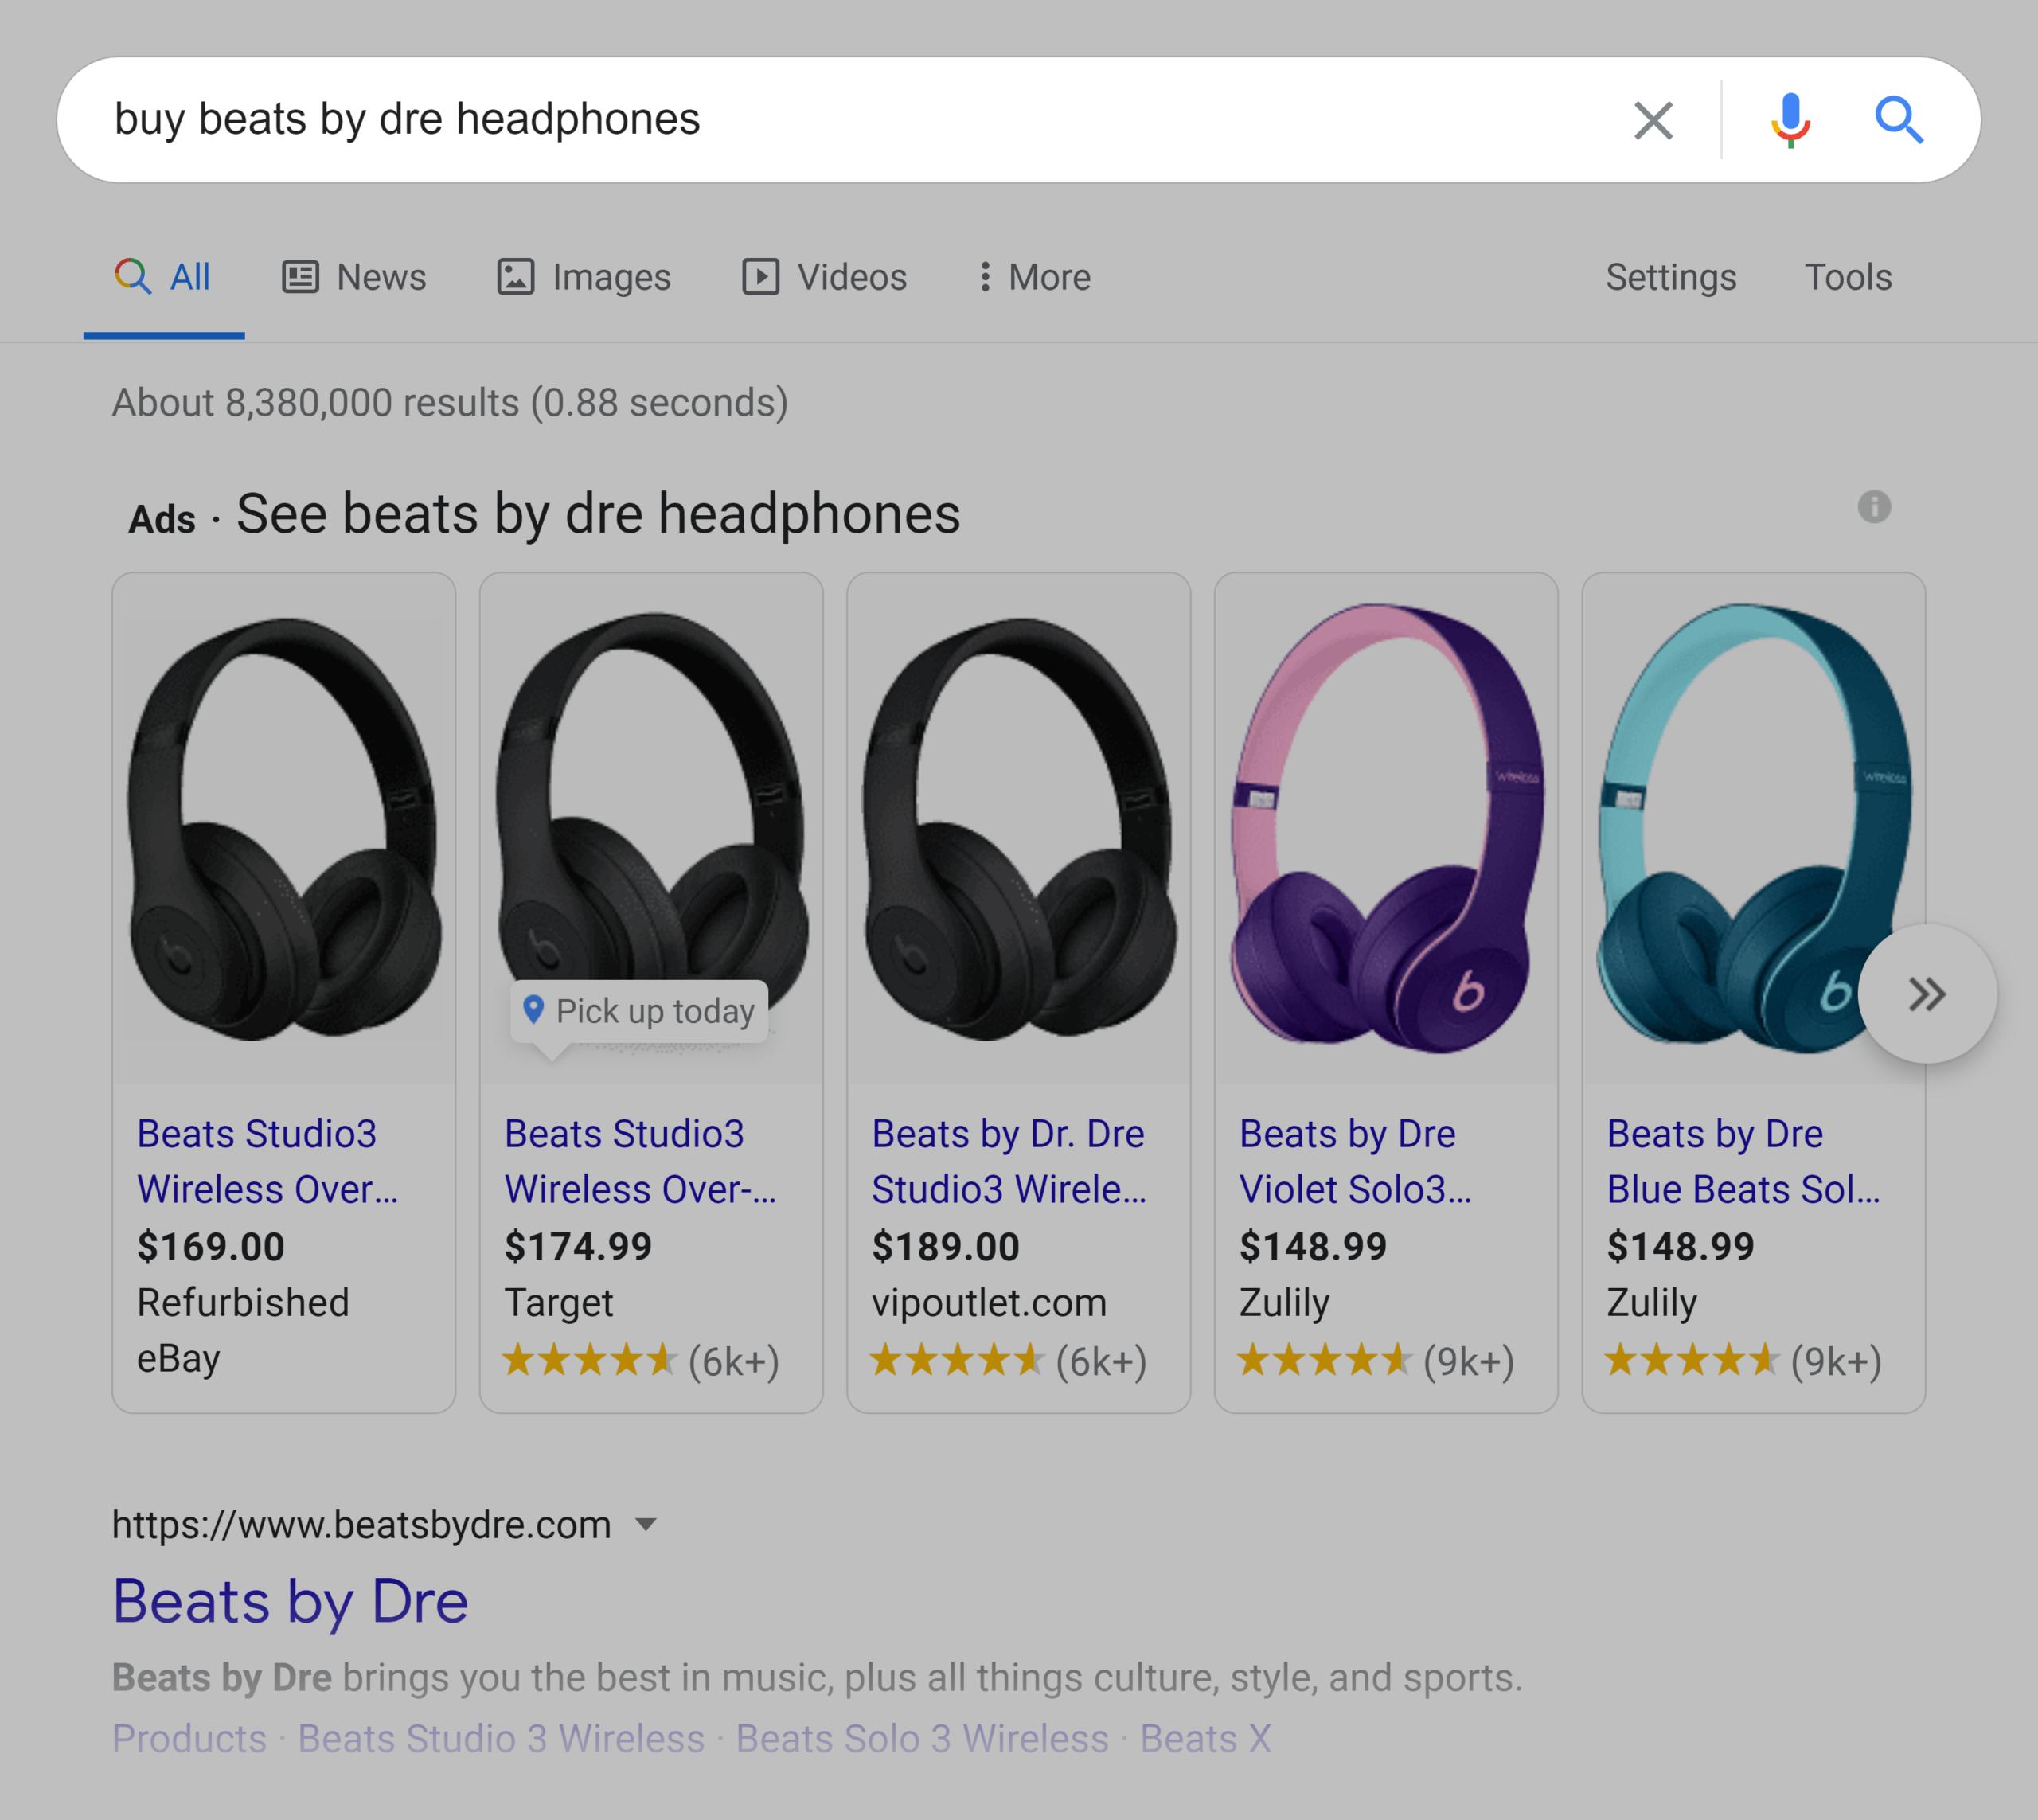 Google SERP – Buy beats by dre headphones